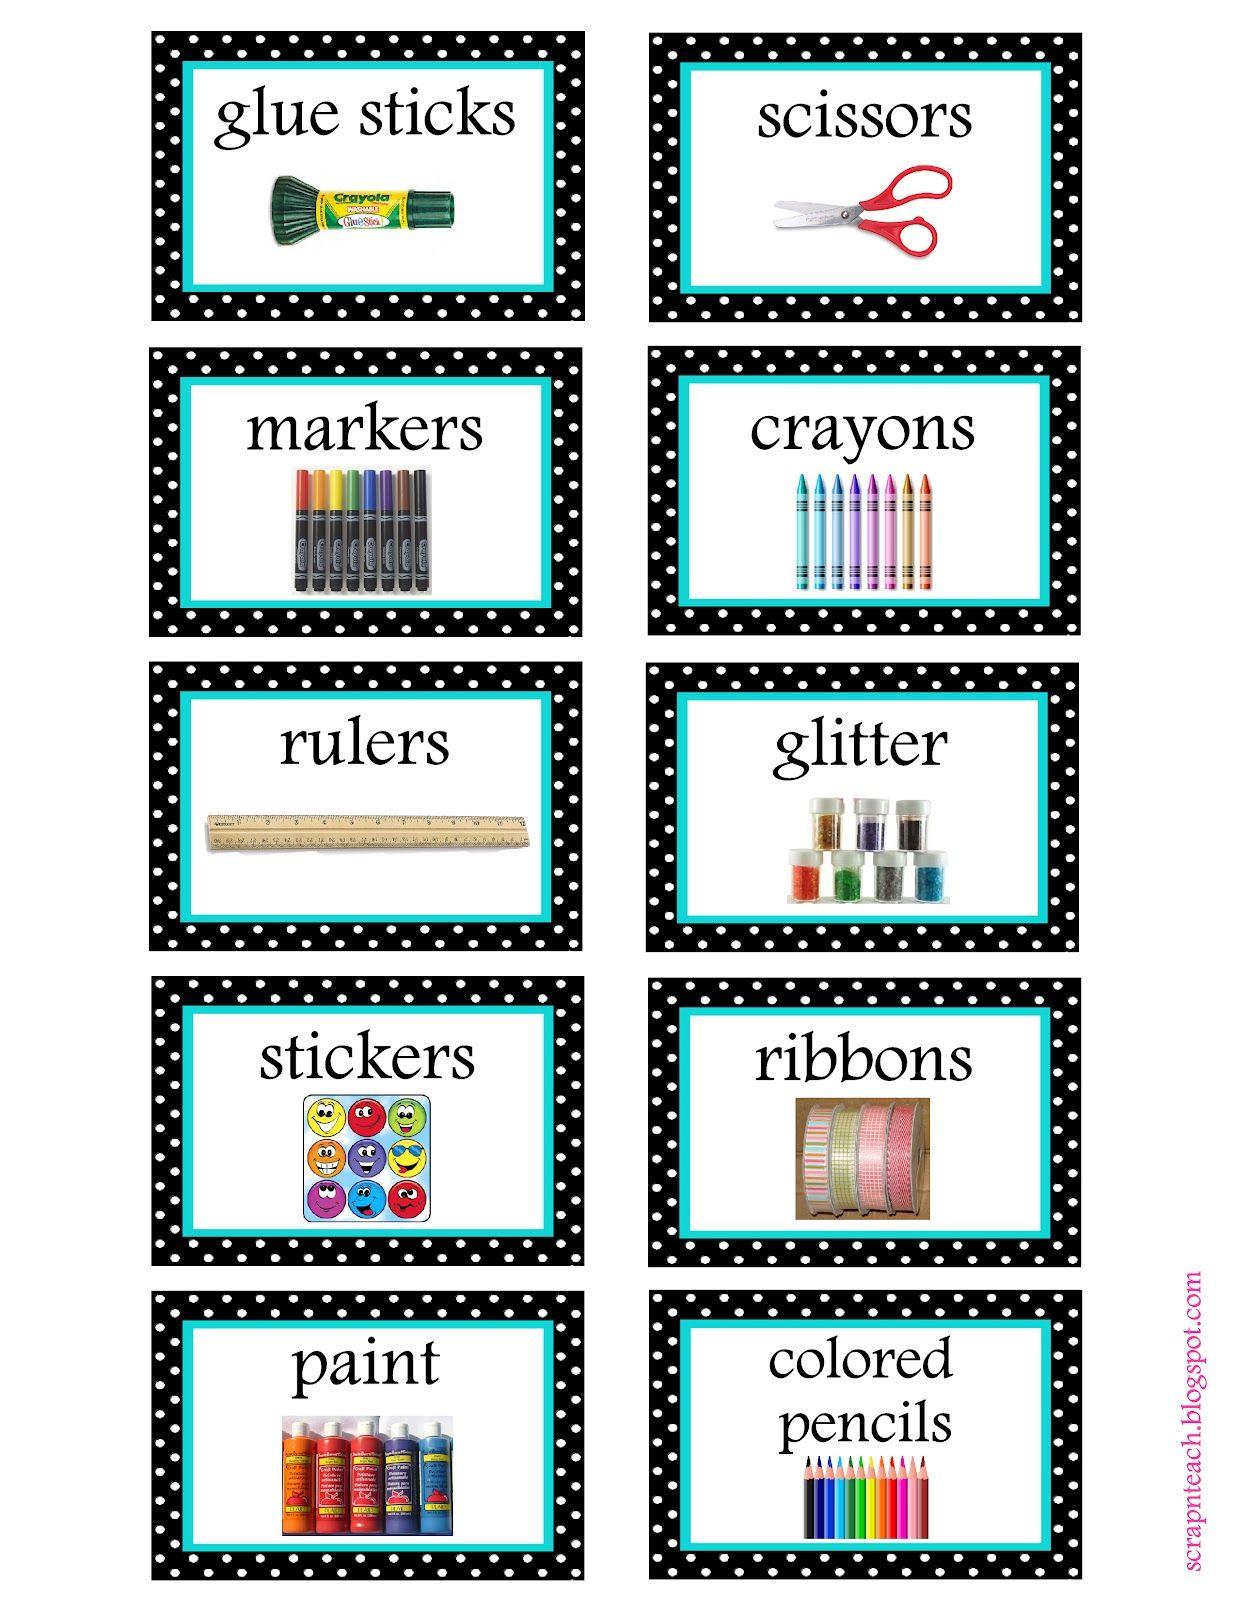 Free Organization Label Printables | Classroom Organization - Free Printable Classroom Labels With Pictures